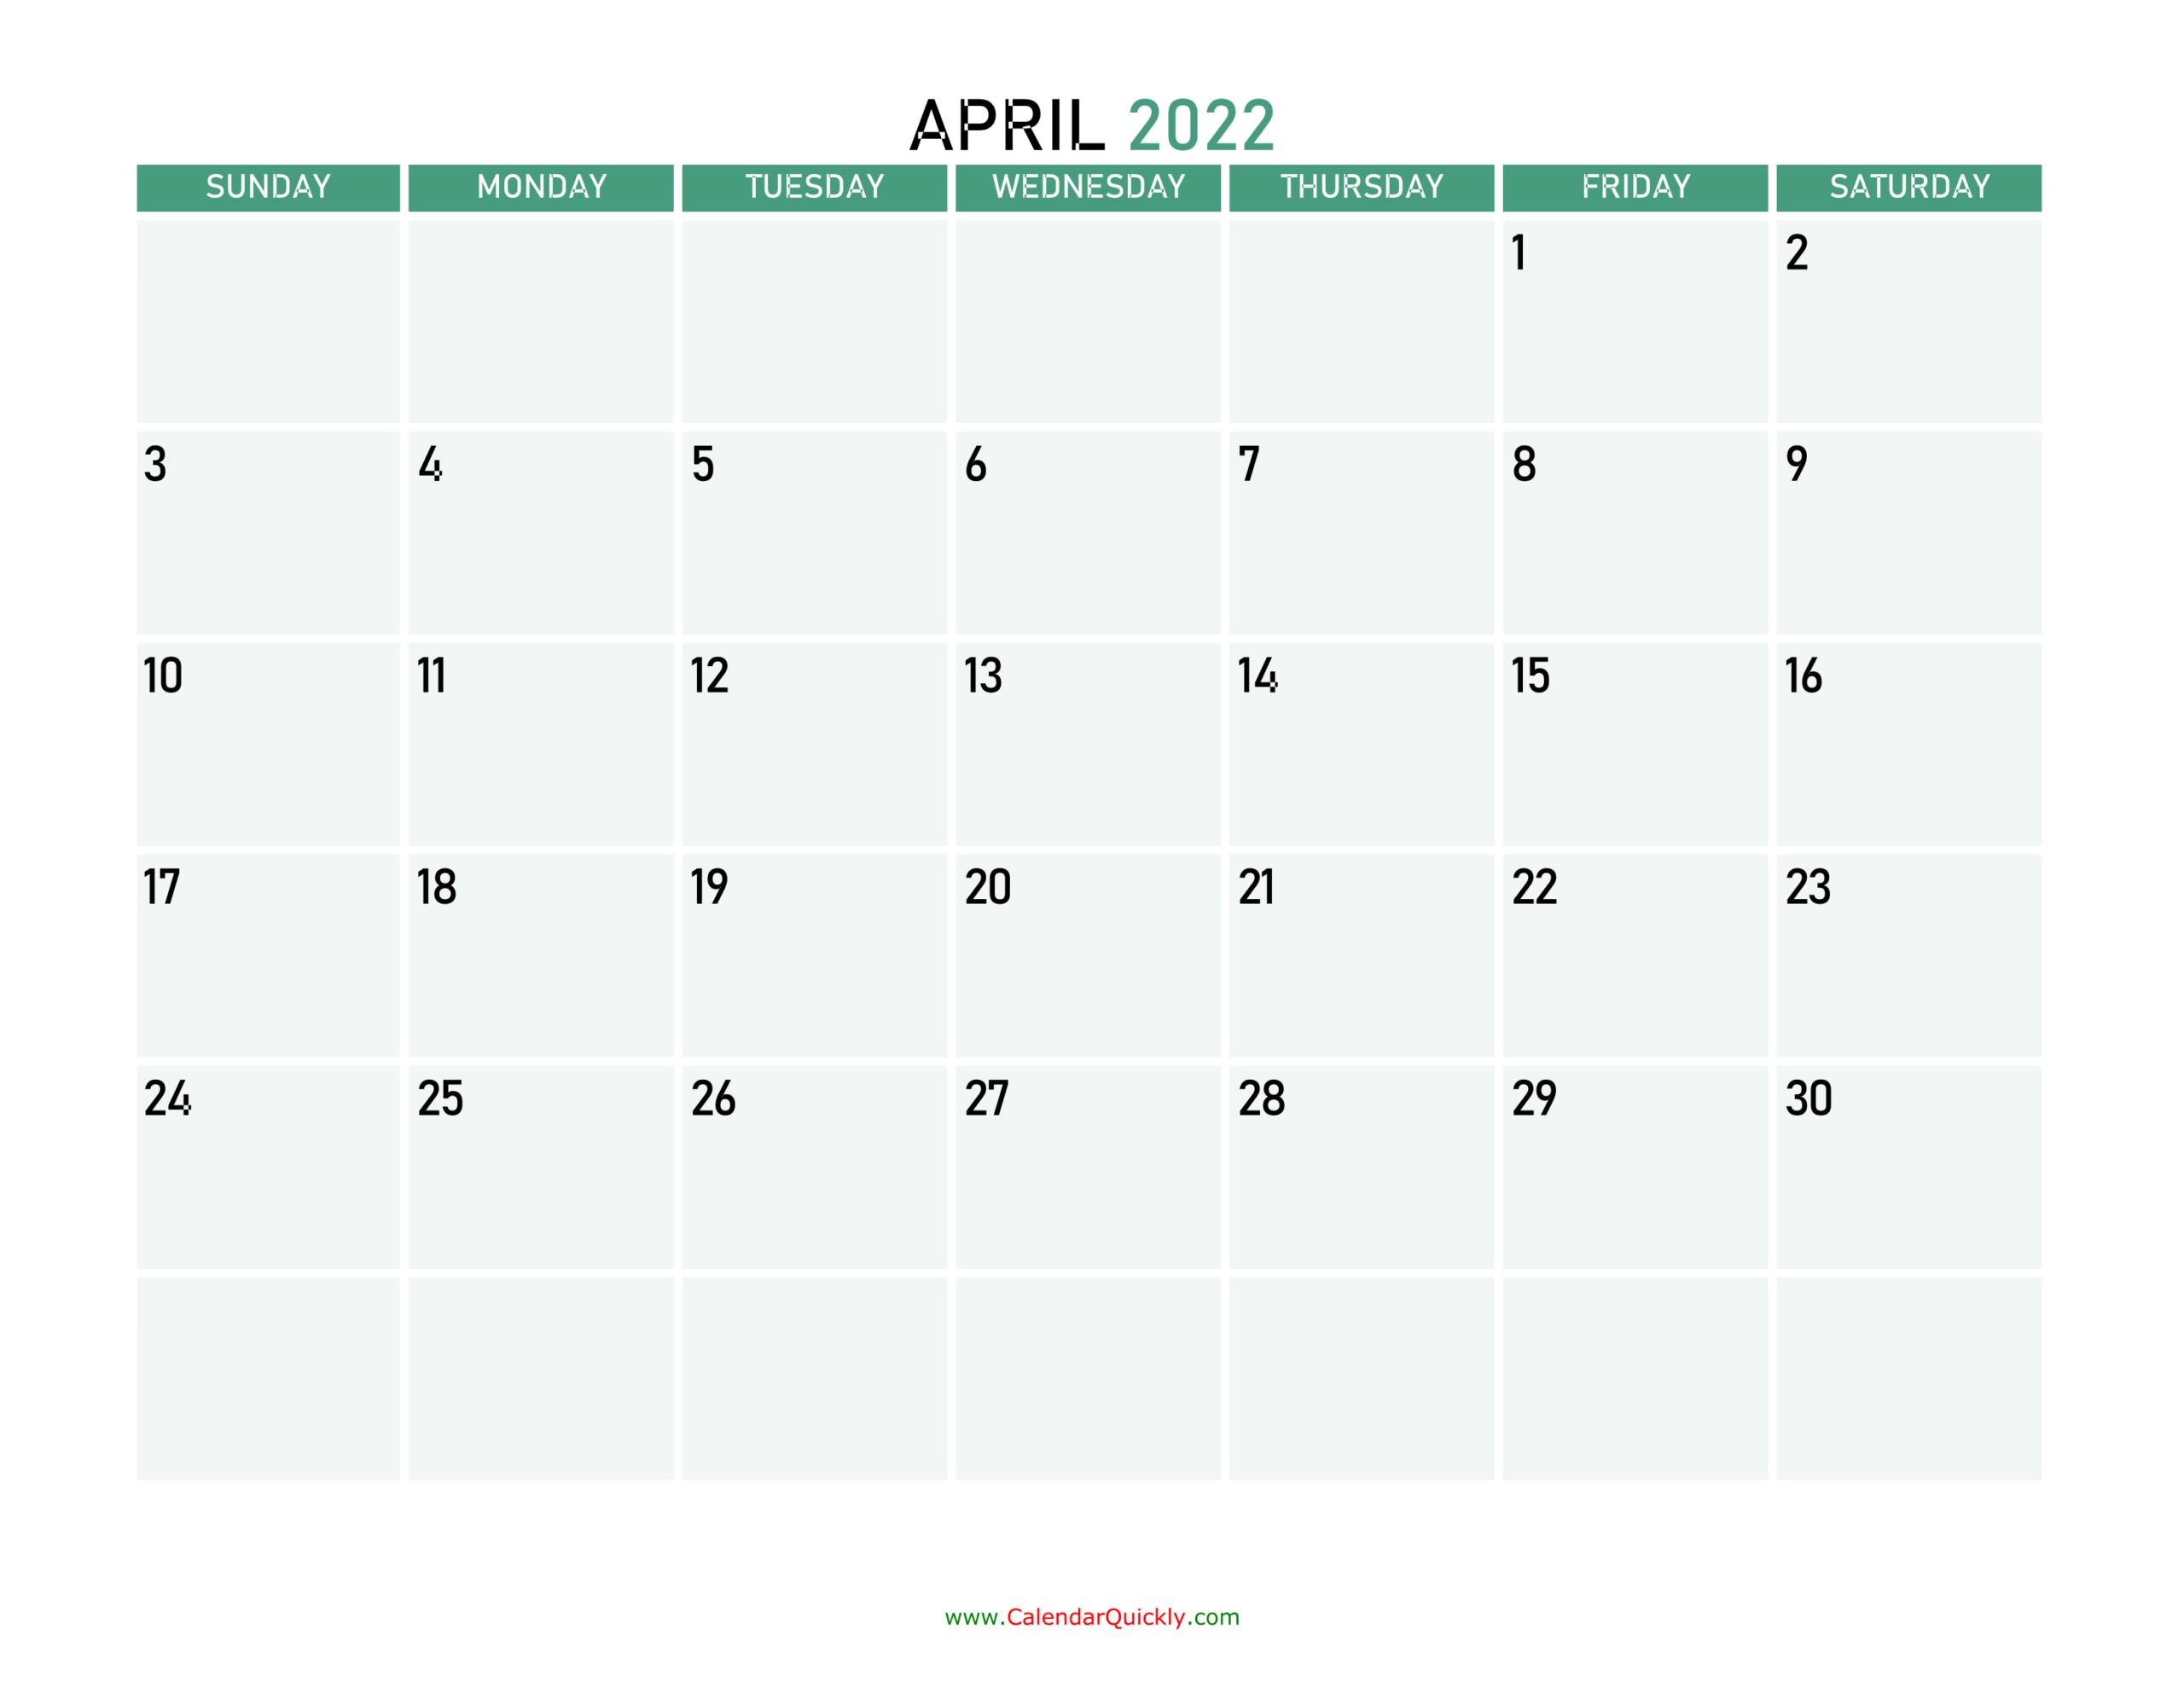 April 2022 Calendars | Calendar Quickly pertaining to Printable April 2022 Calendar Template